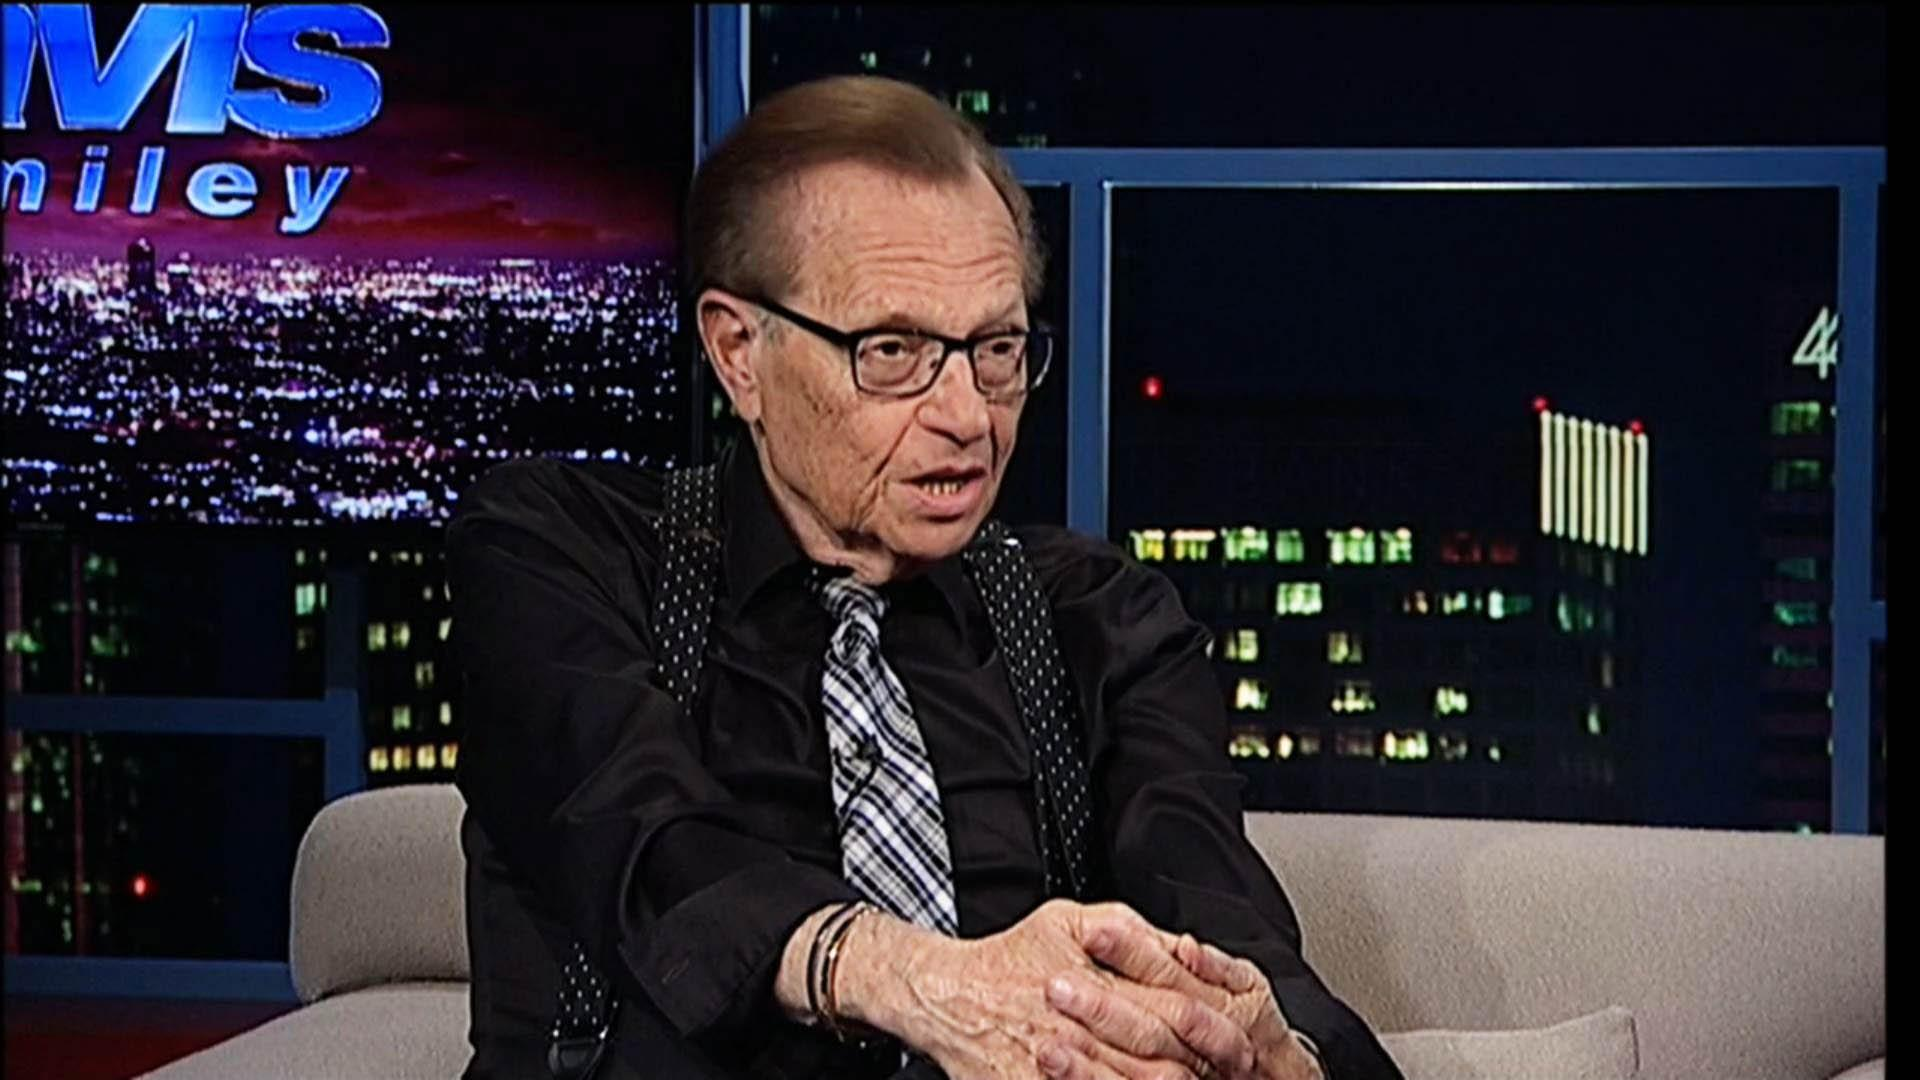 Talk show host Larry King image